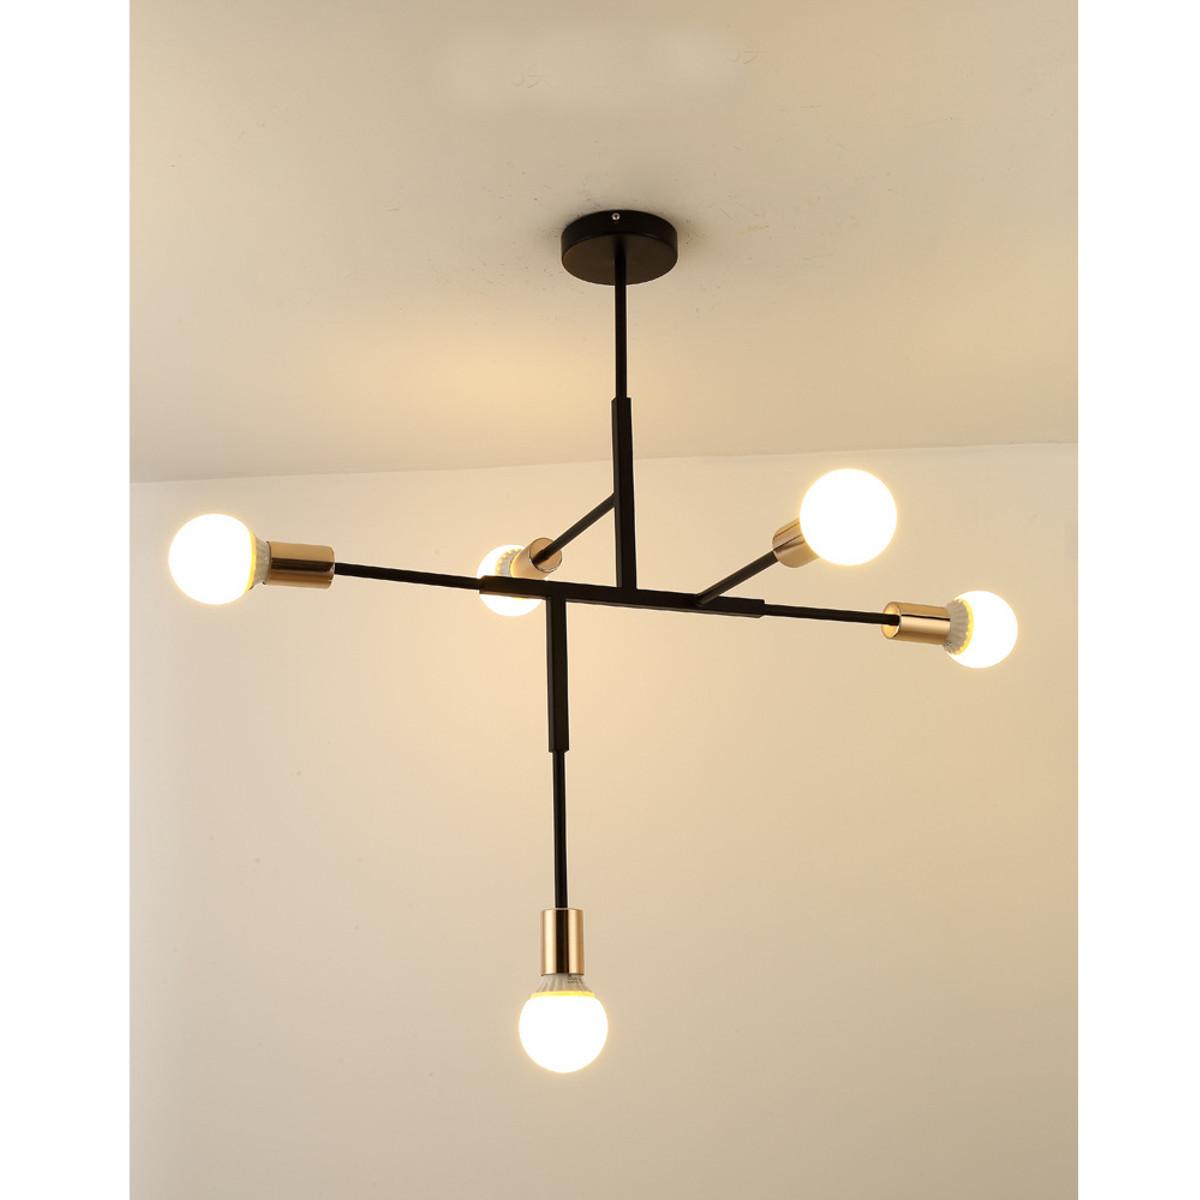 Wedlies modern metal pendant lighting hanging lamp ceiling chandelier with 5 lights fixture flush mount walmart com